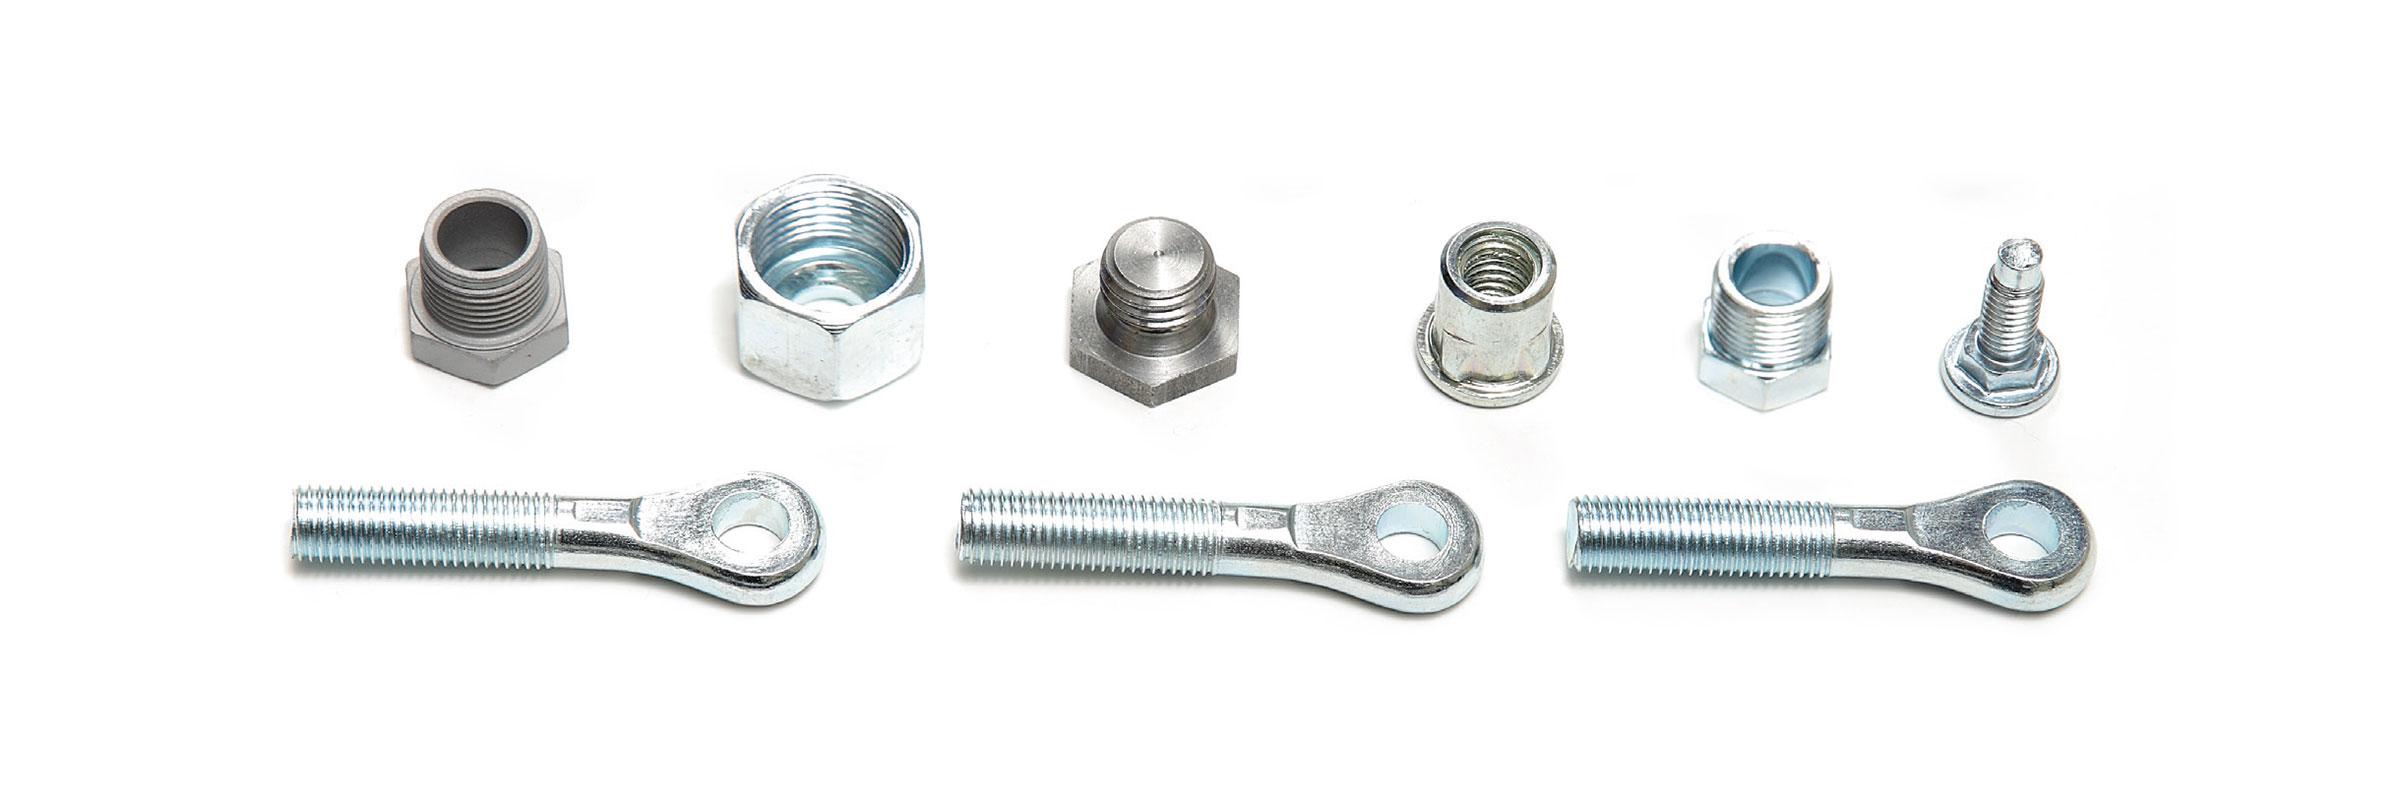 ursus-industrial-services-threading-samples